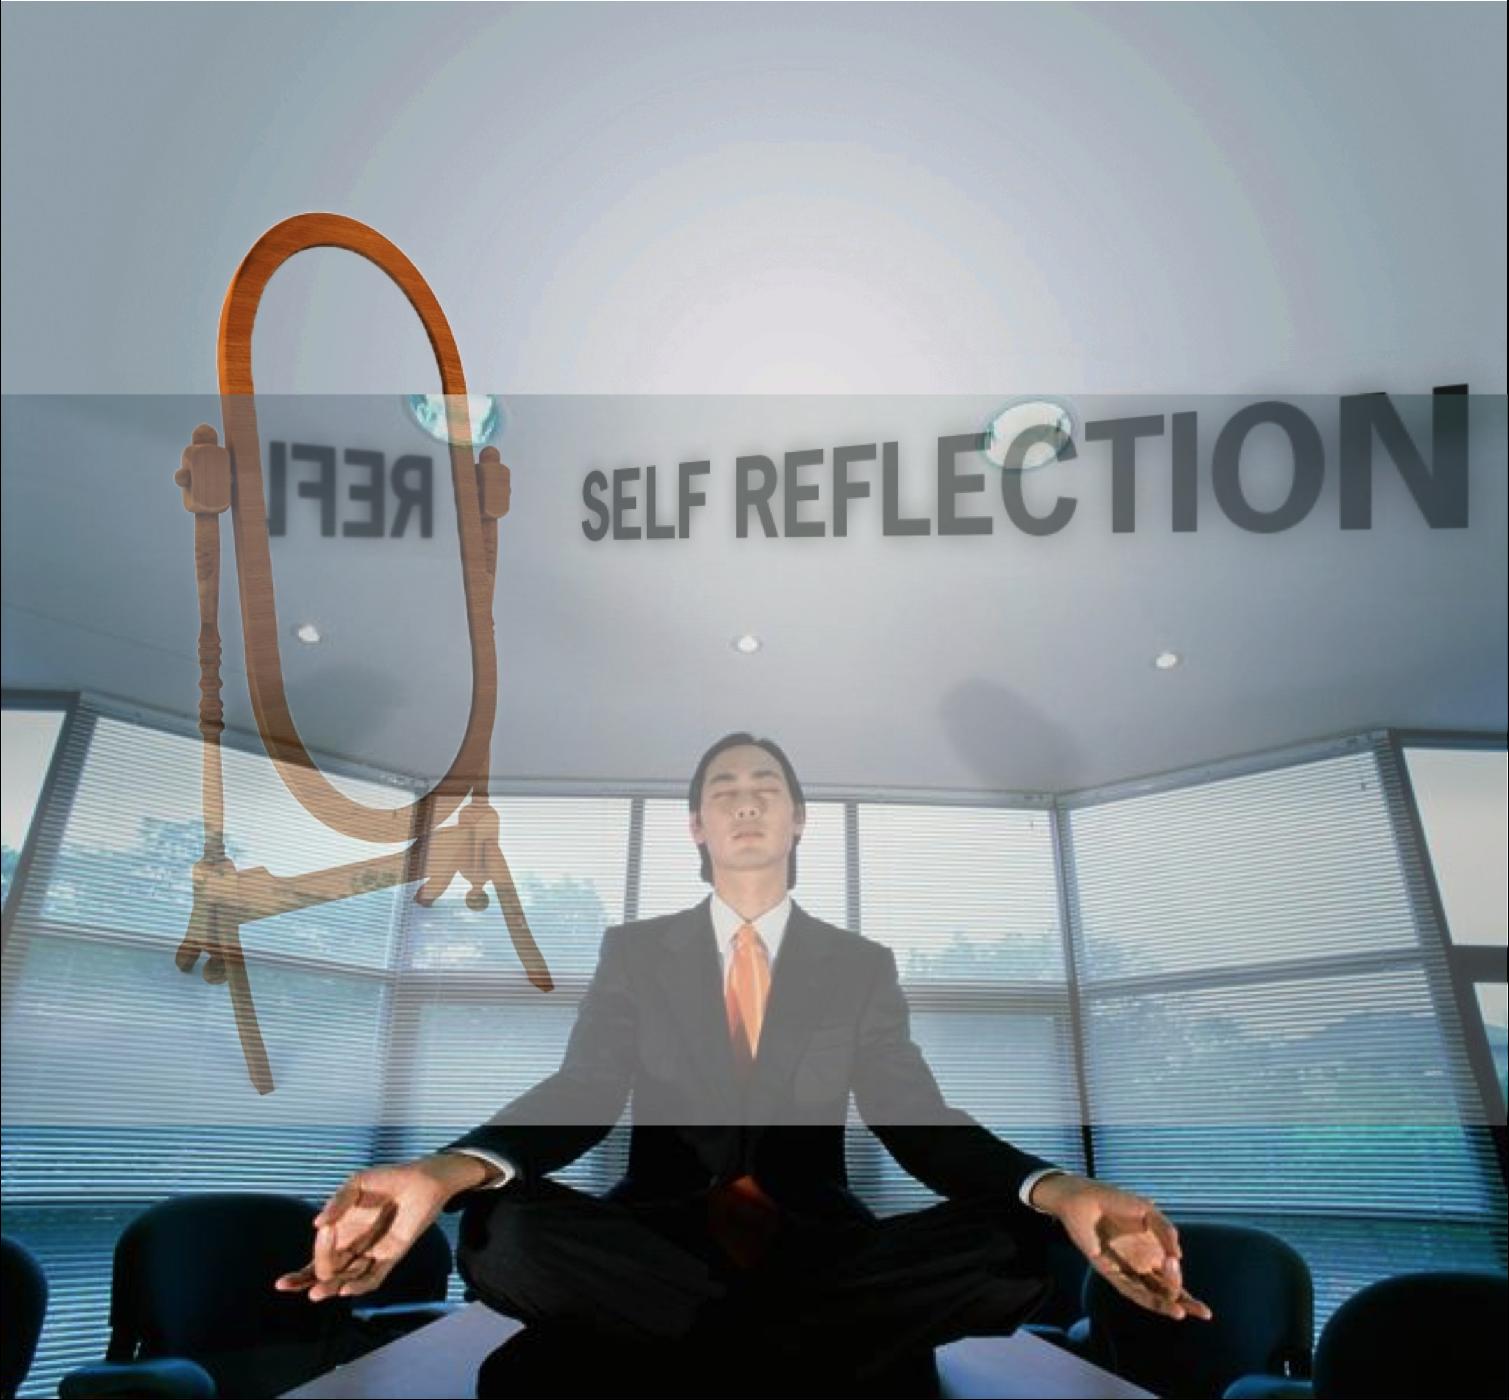 Business spiritualiteit, mediterende man